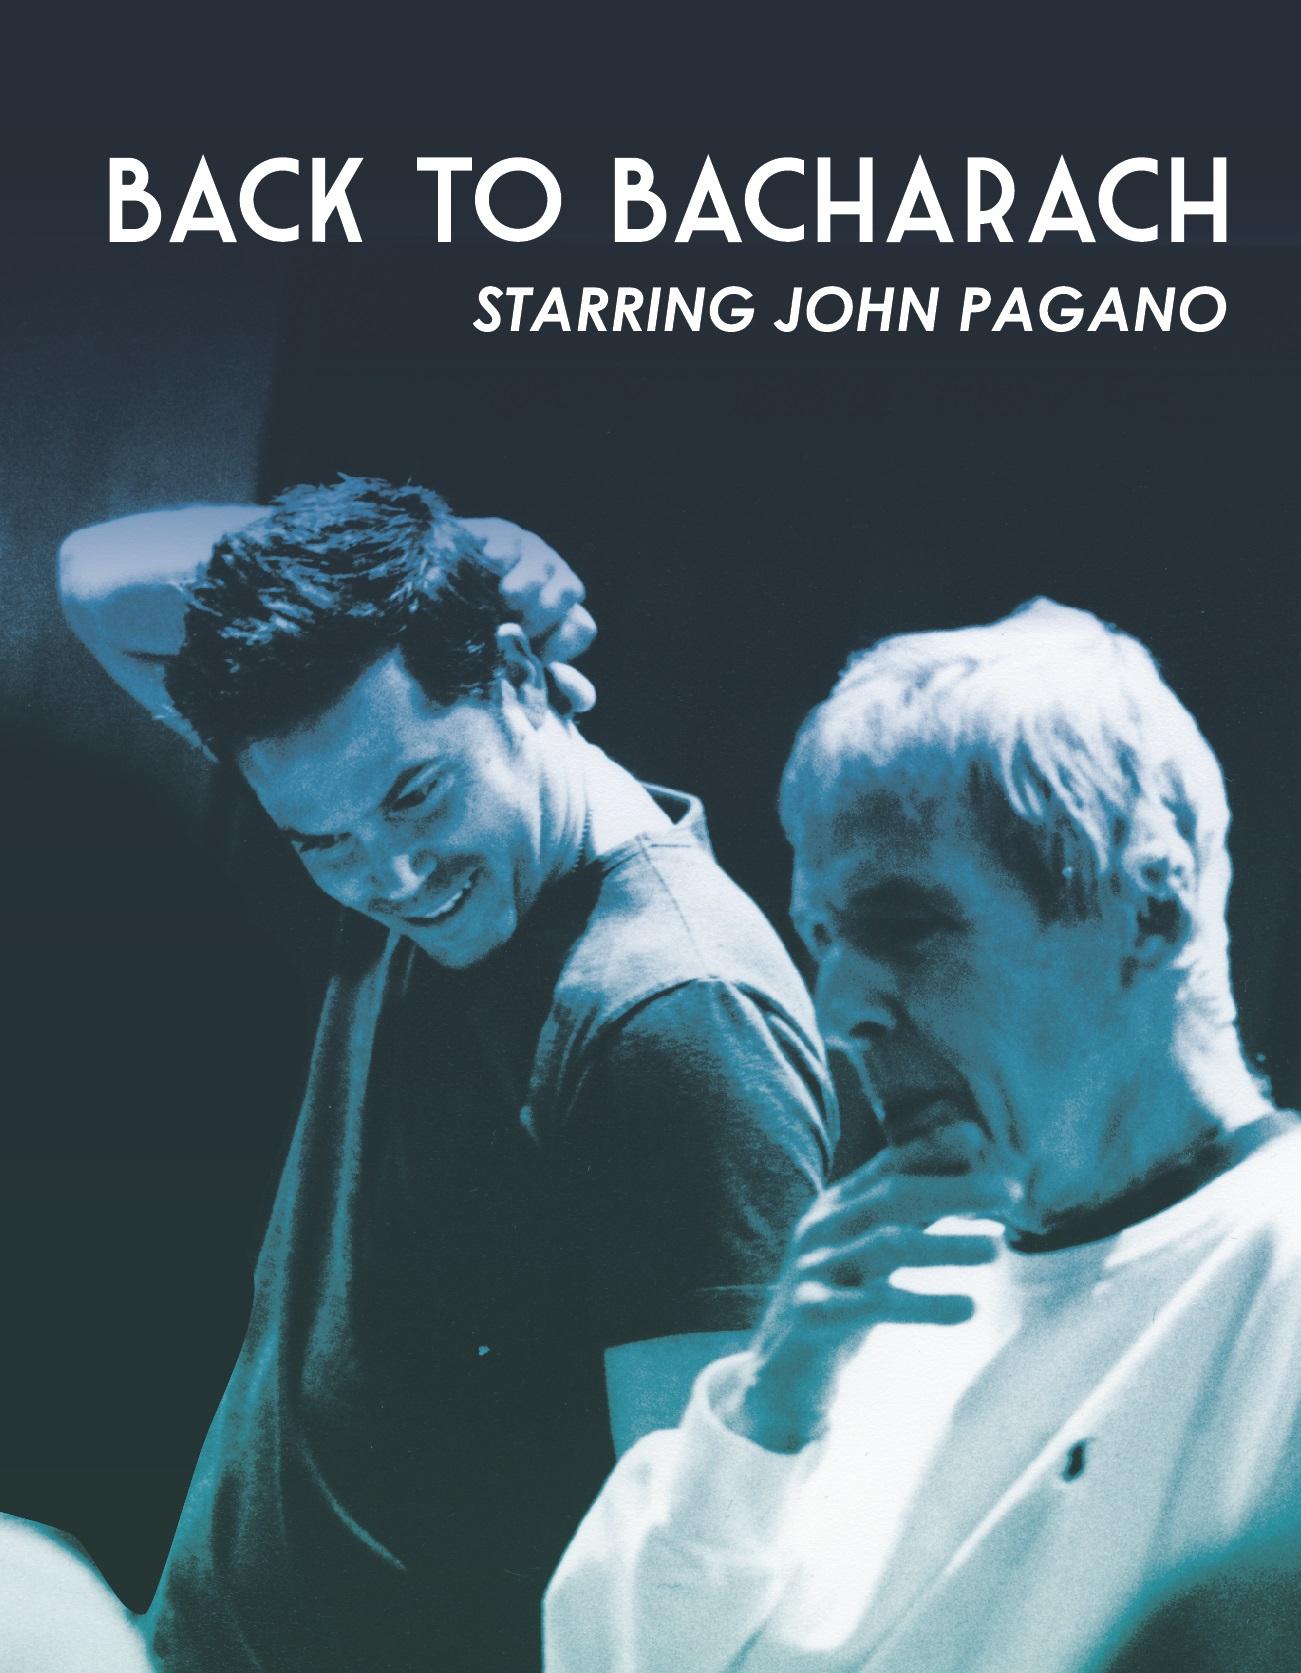 Back to Bacharach:  A Tribute to My Mentor, My Friend…BURT BACHARACH